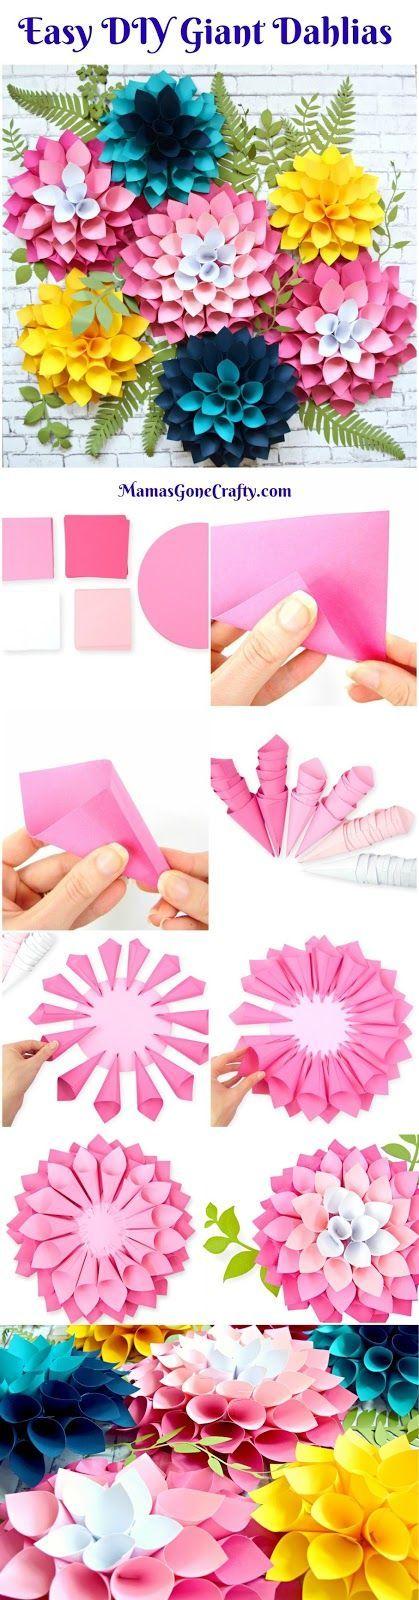 How to make giant paper dahlias - flower templates - DIY paper flowers